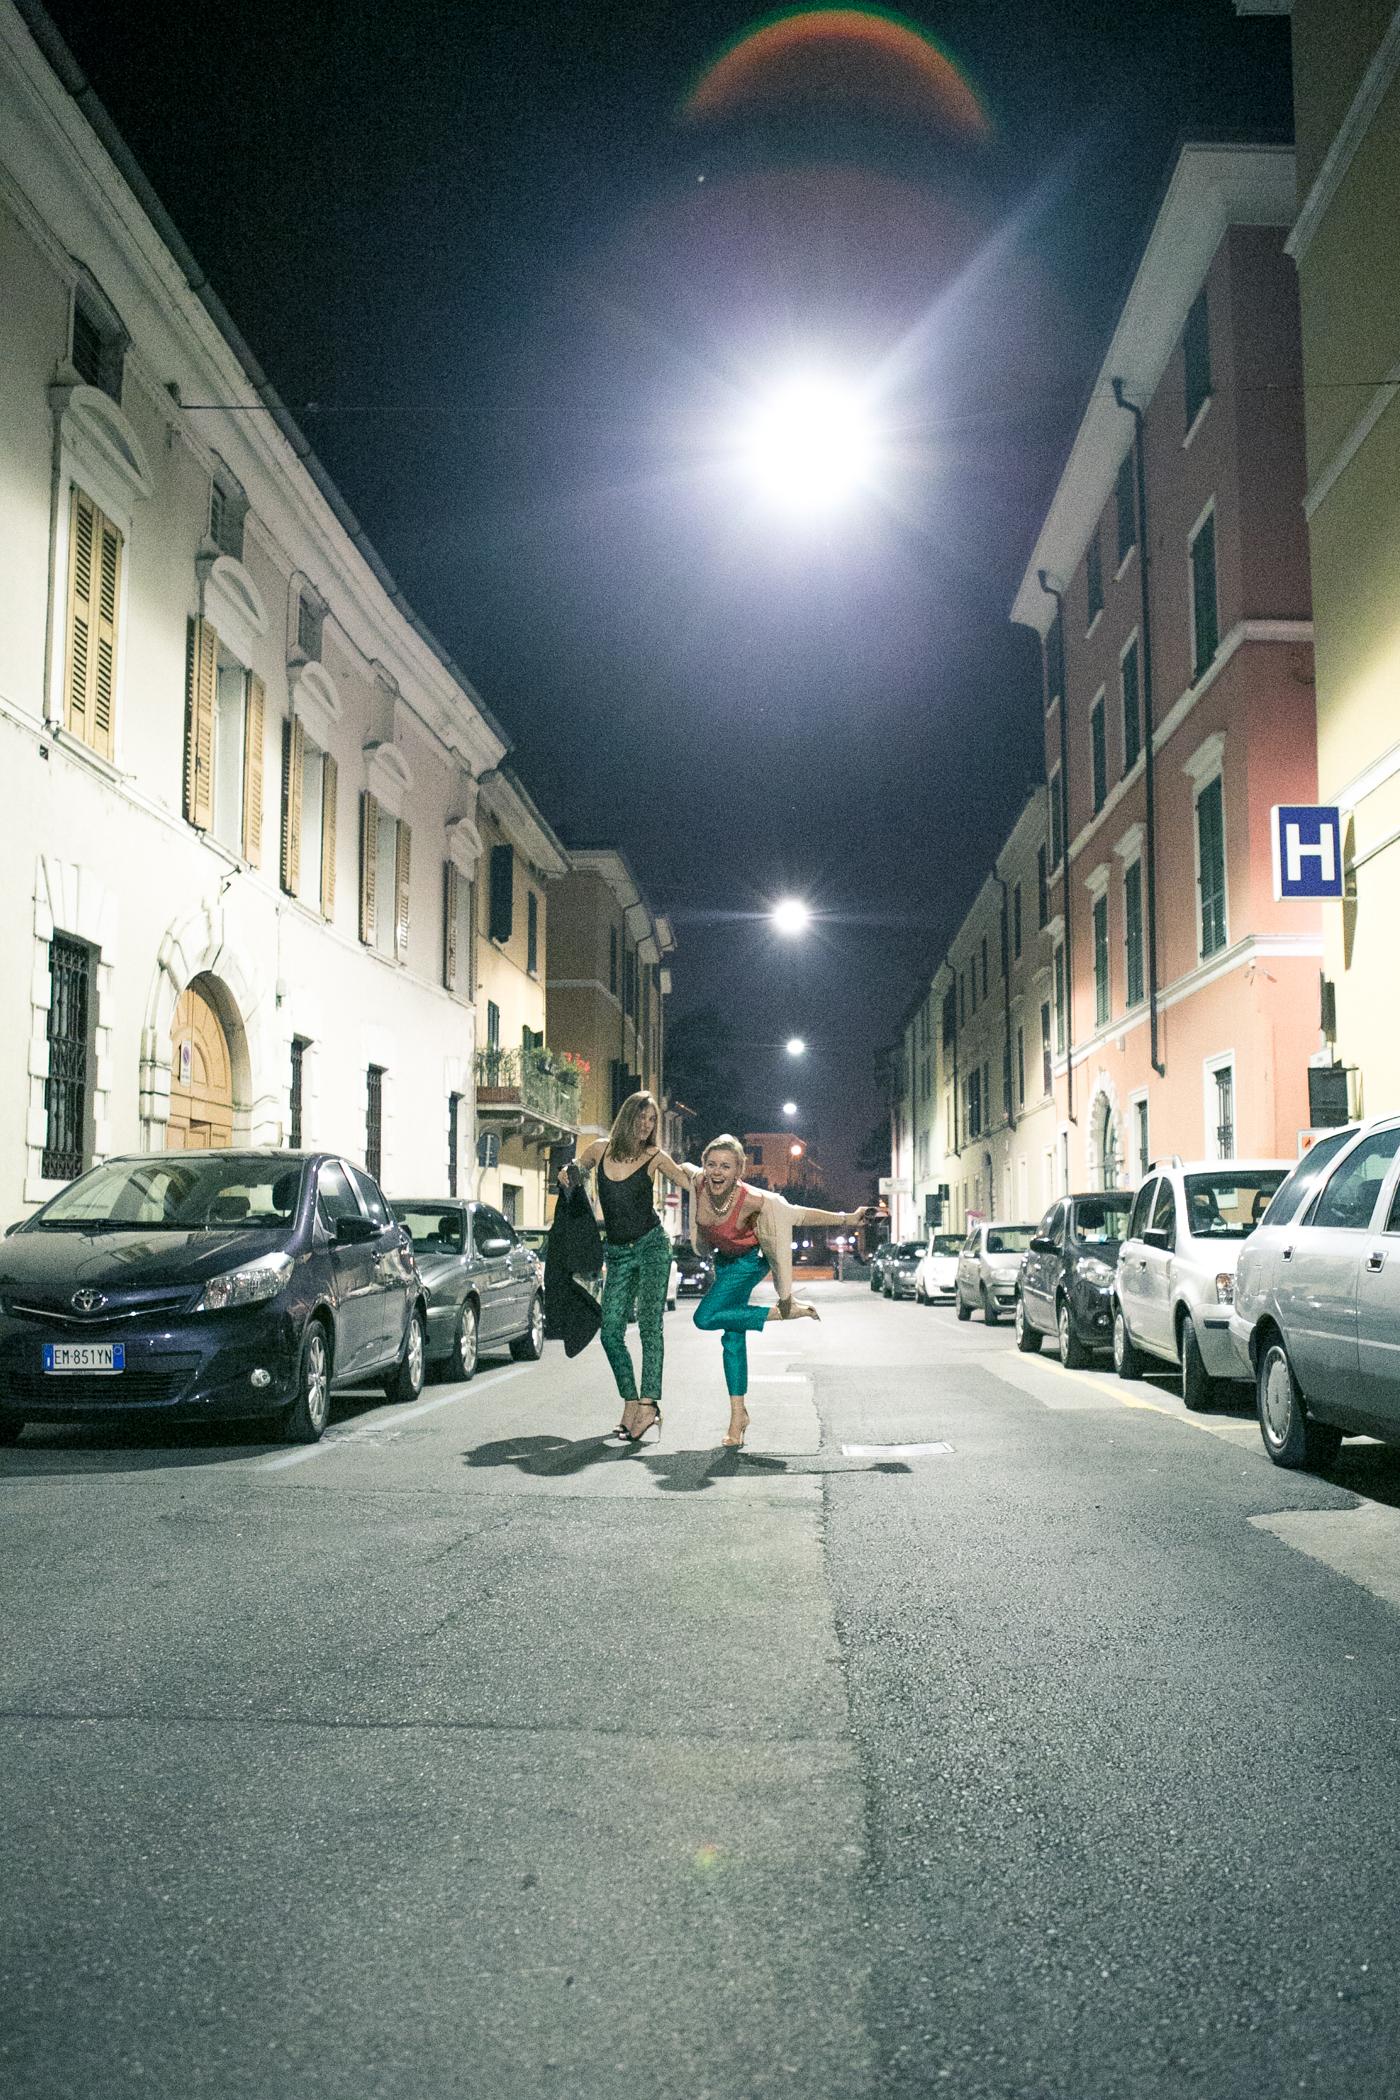 thecablook darya kamalova fashion blog street style asos pants hm top coral beige jacket zara heels brescia at night franco bar piazza duomo-33